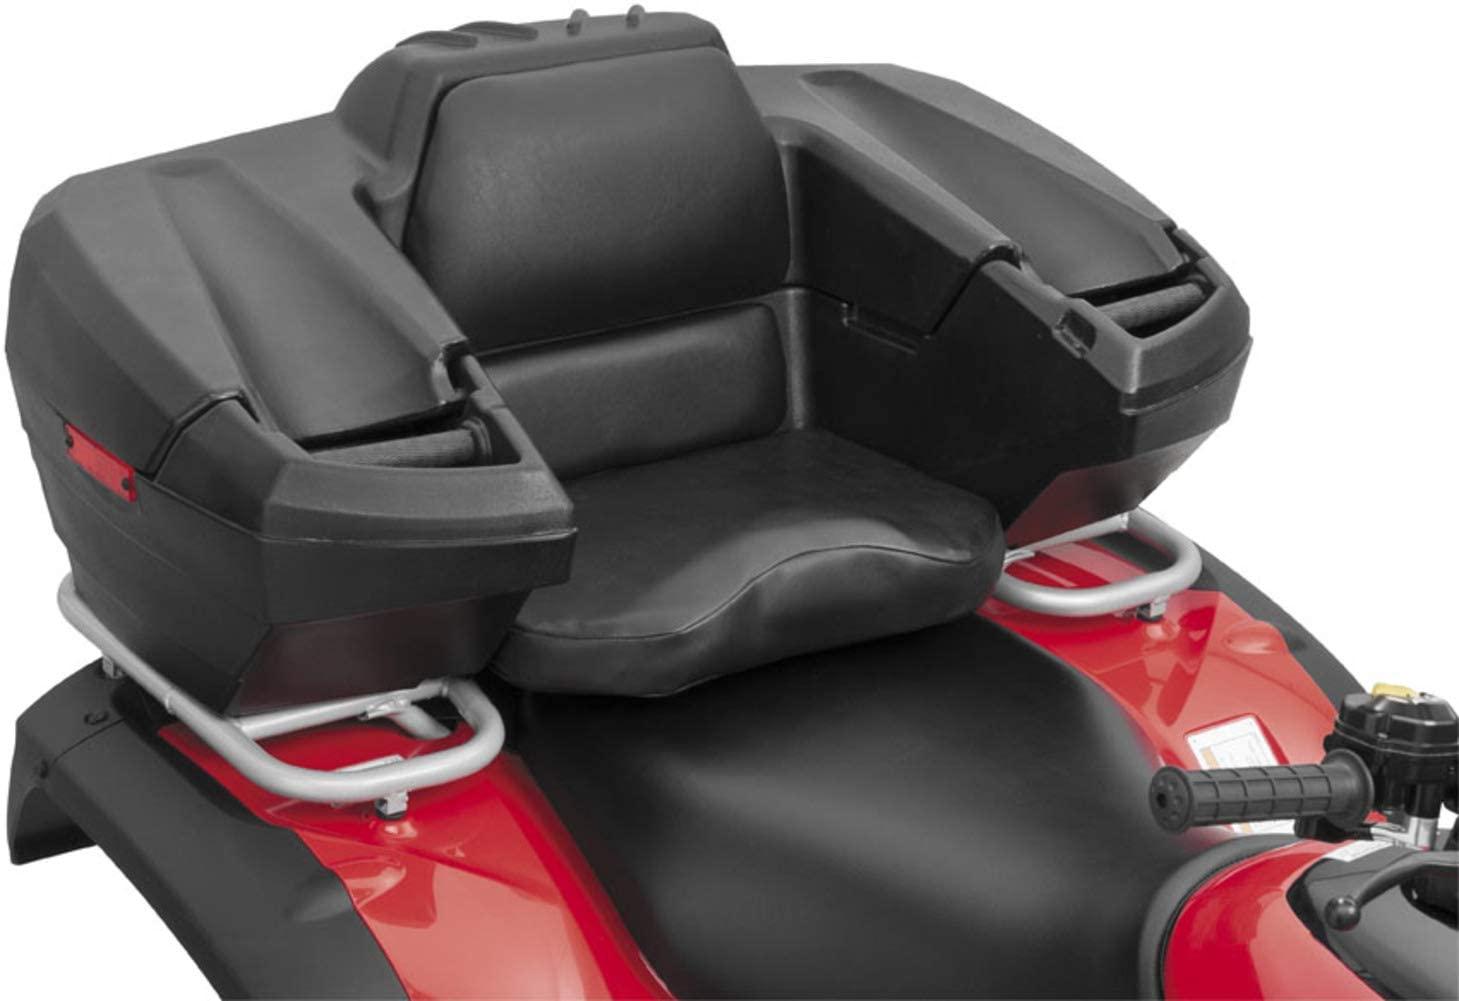 Quadboss - J-R/S4-C - Replacement Seat Cushion